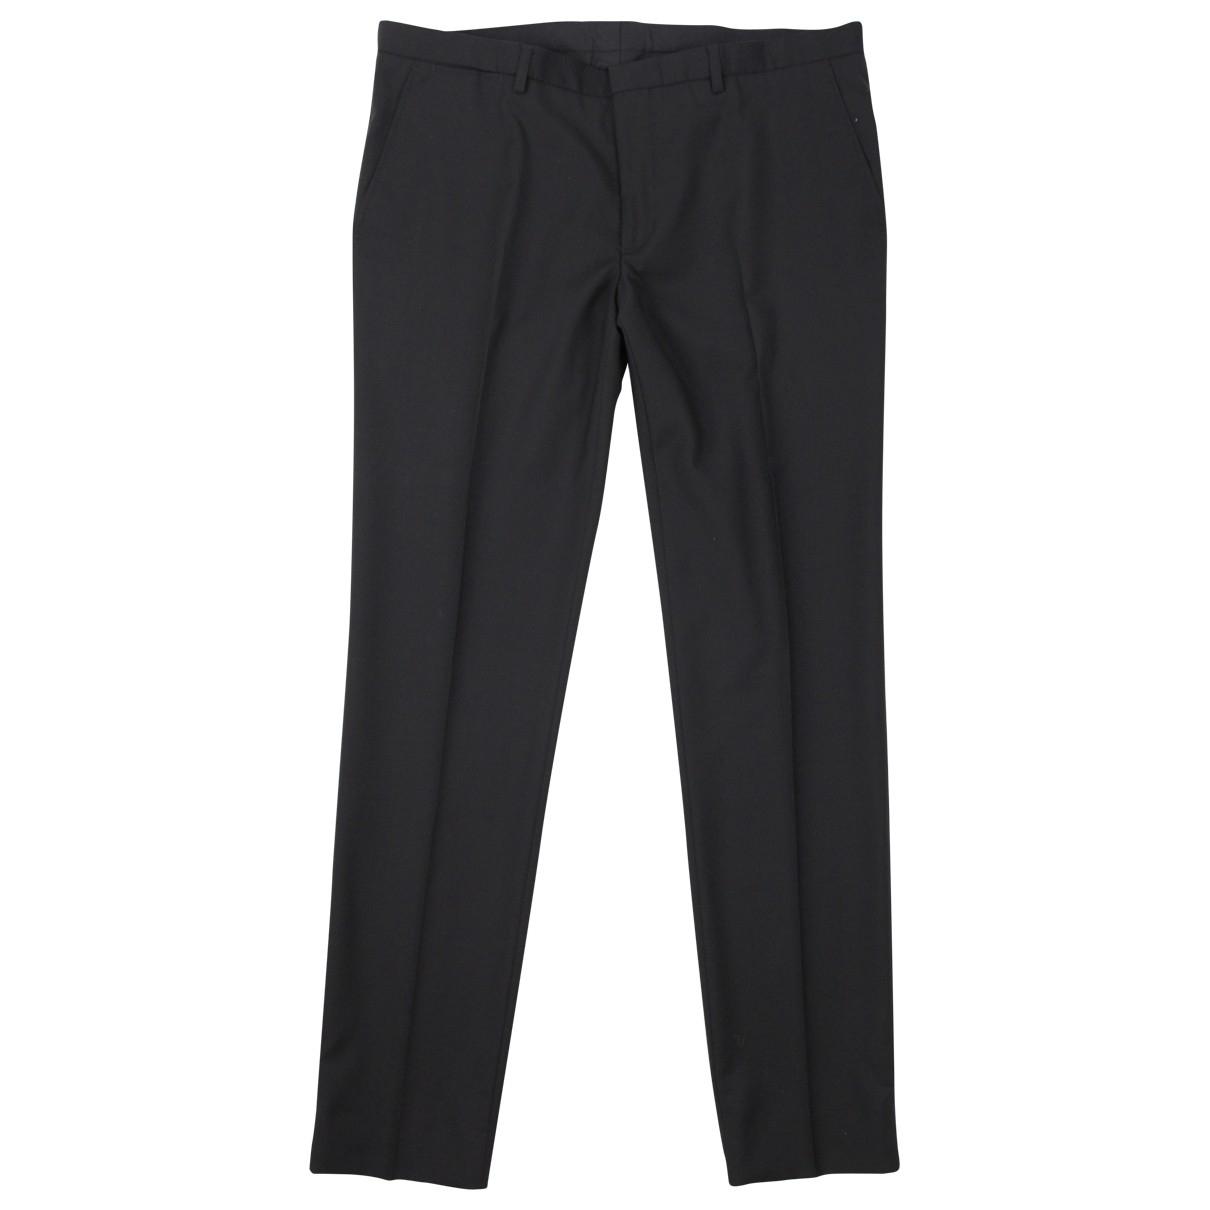 Pantalon de Lana J.lindeberg